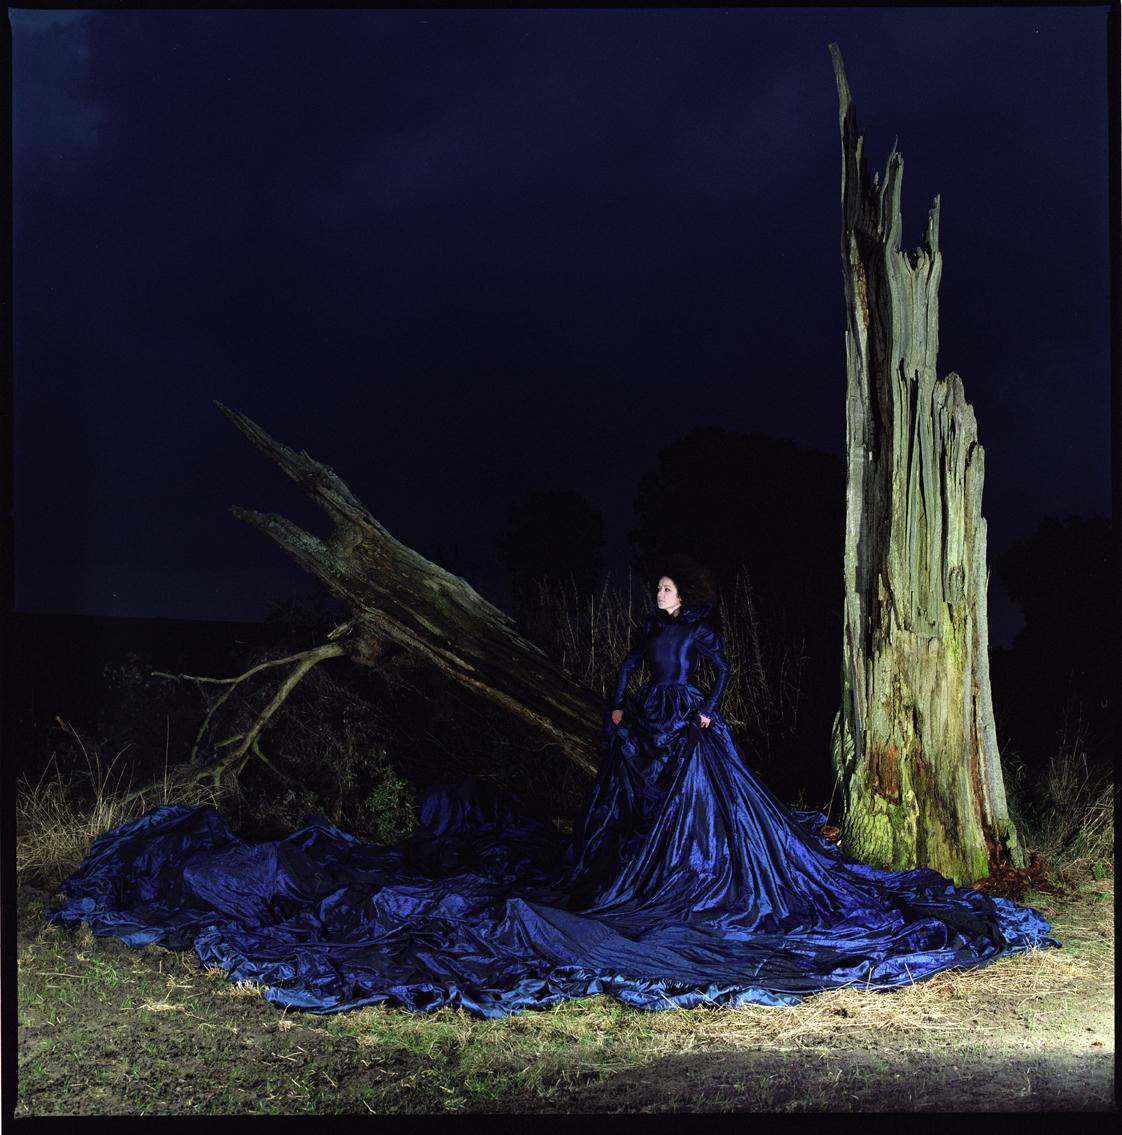 Dreaming dresses de Kirstie MacLeod